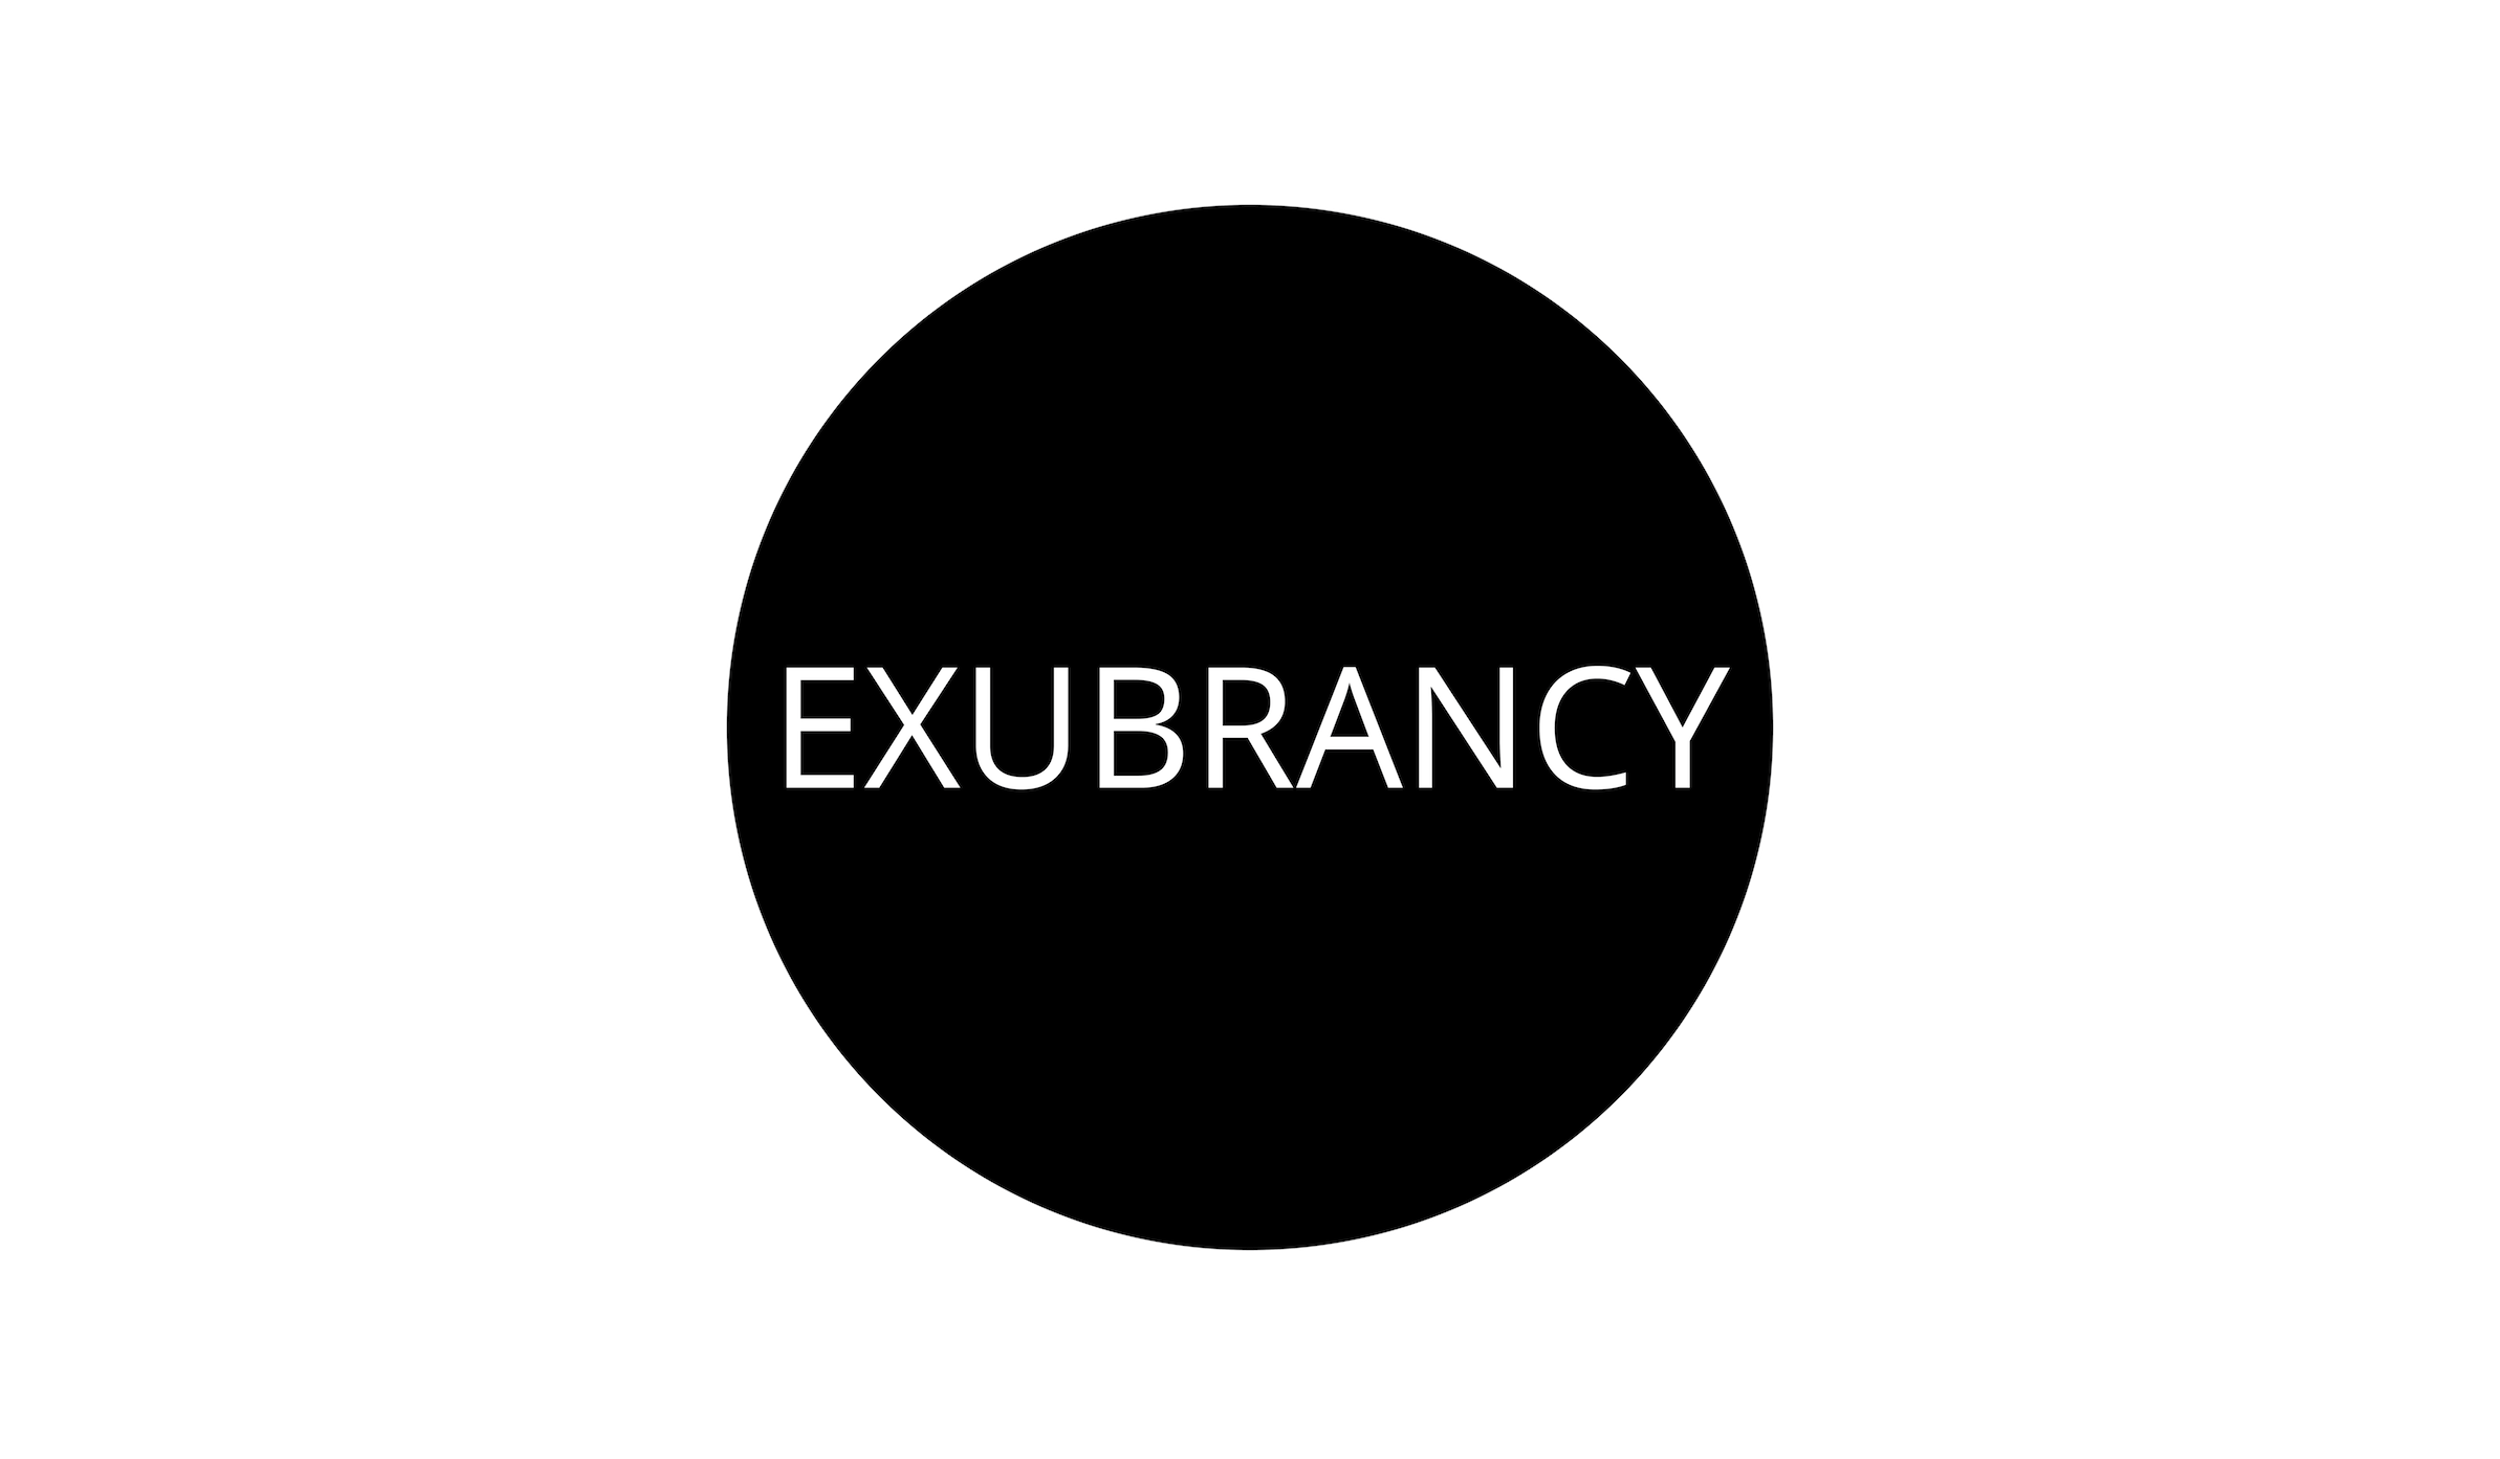 exubrancy_logo2.png